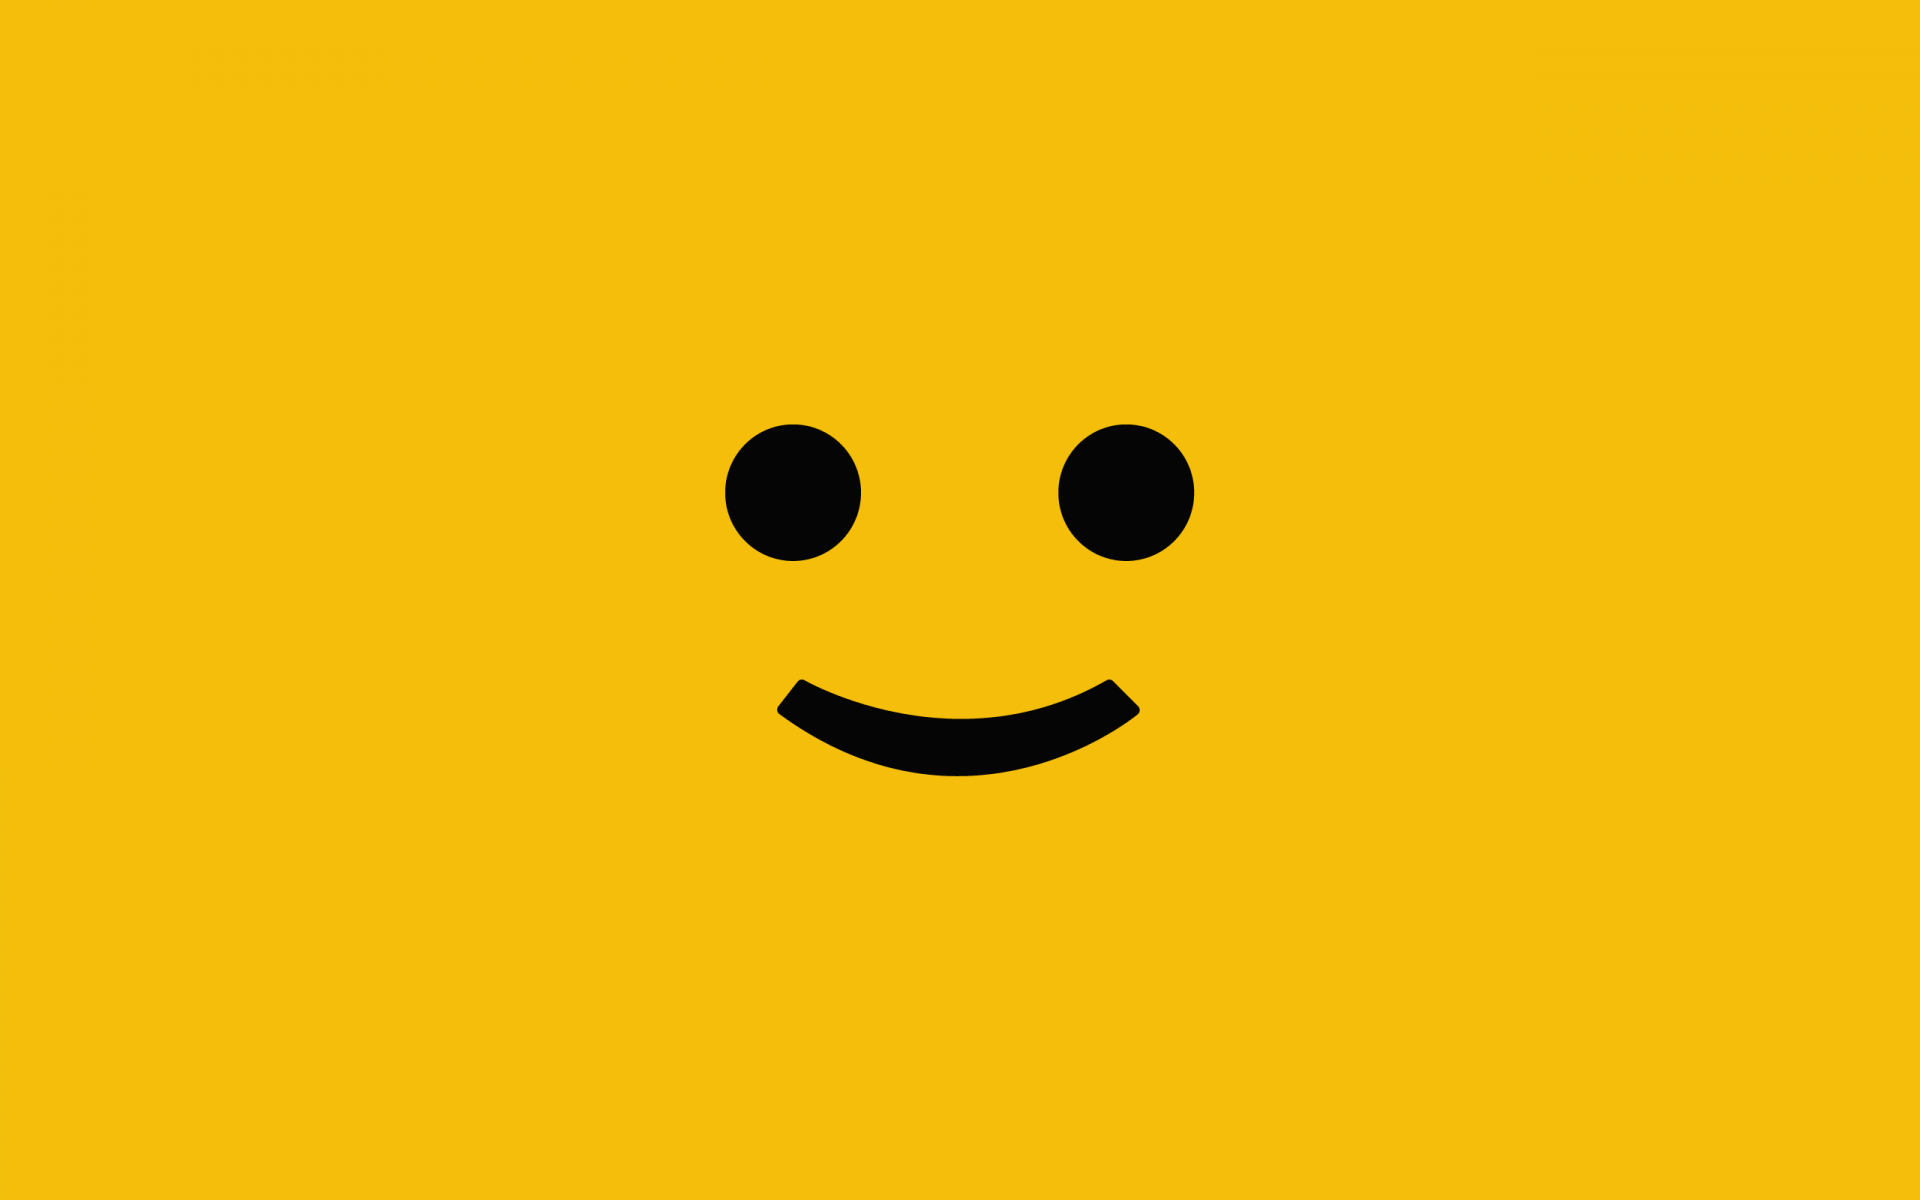 yellow aesthetic wallpaper hd